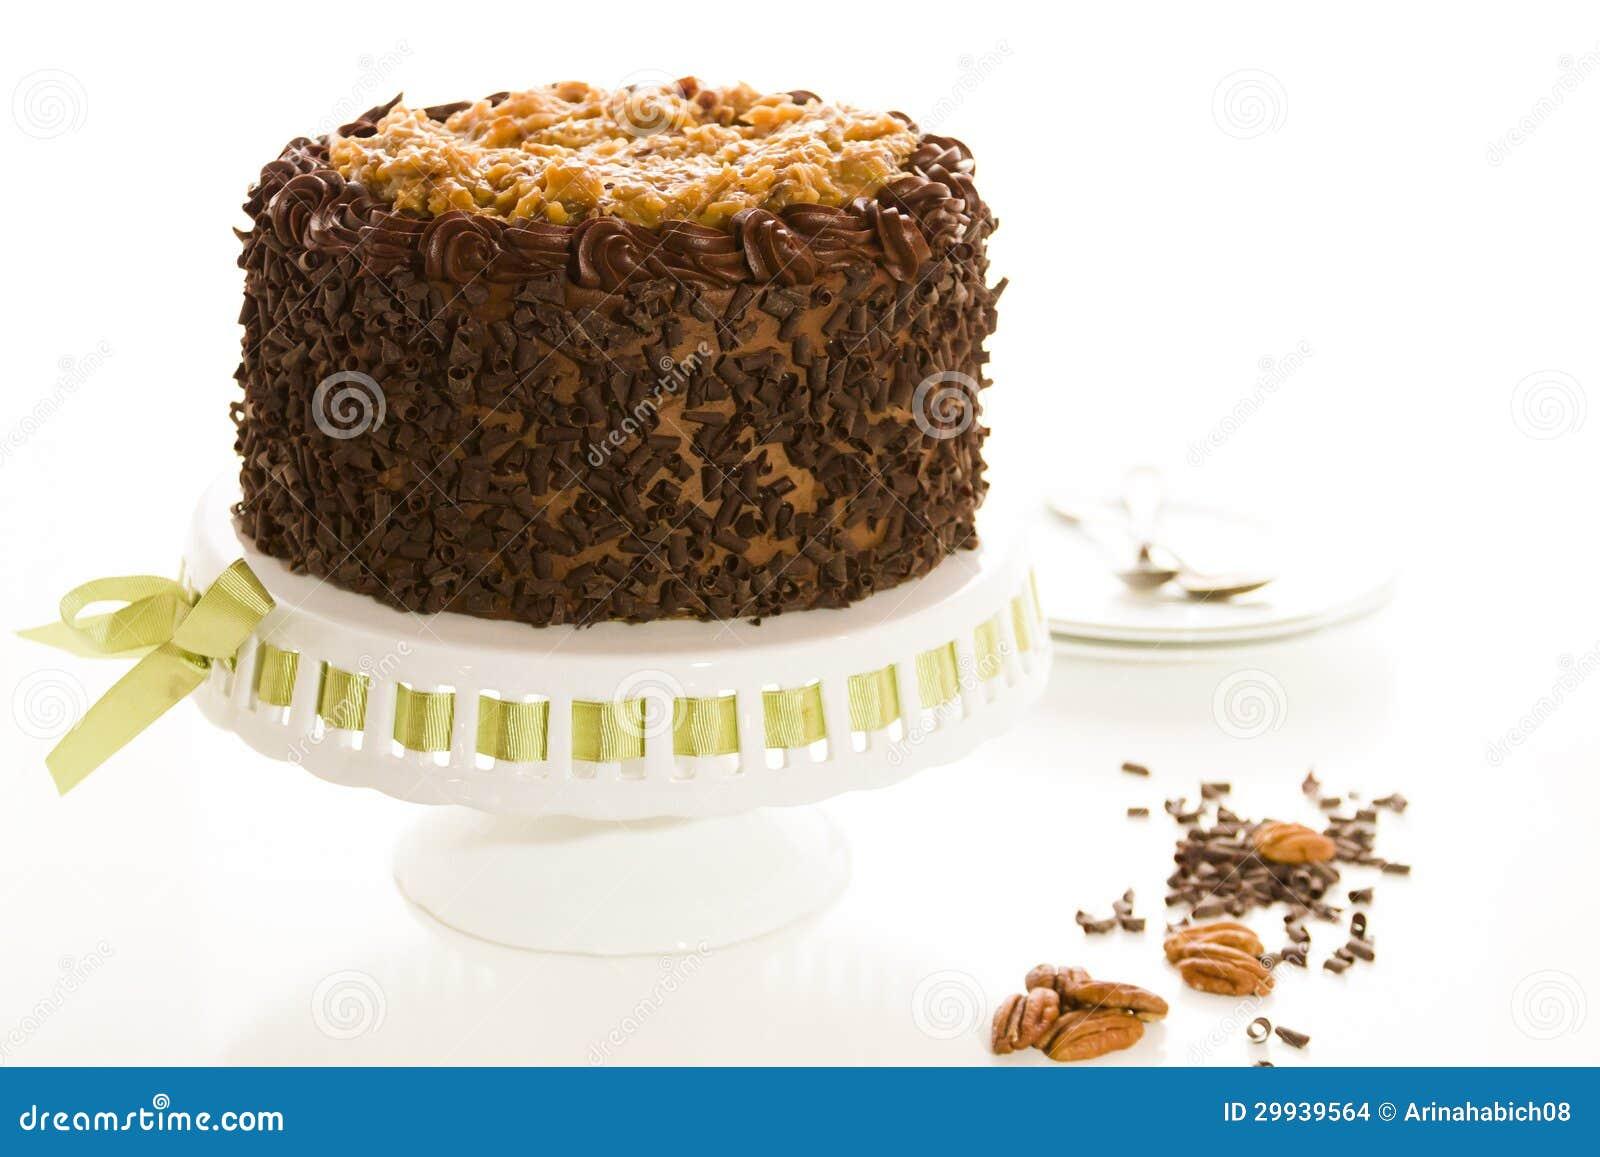 German Chocolate Cake Stock Images - Image: 29939564